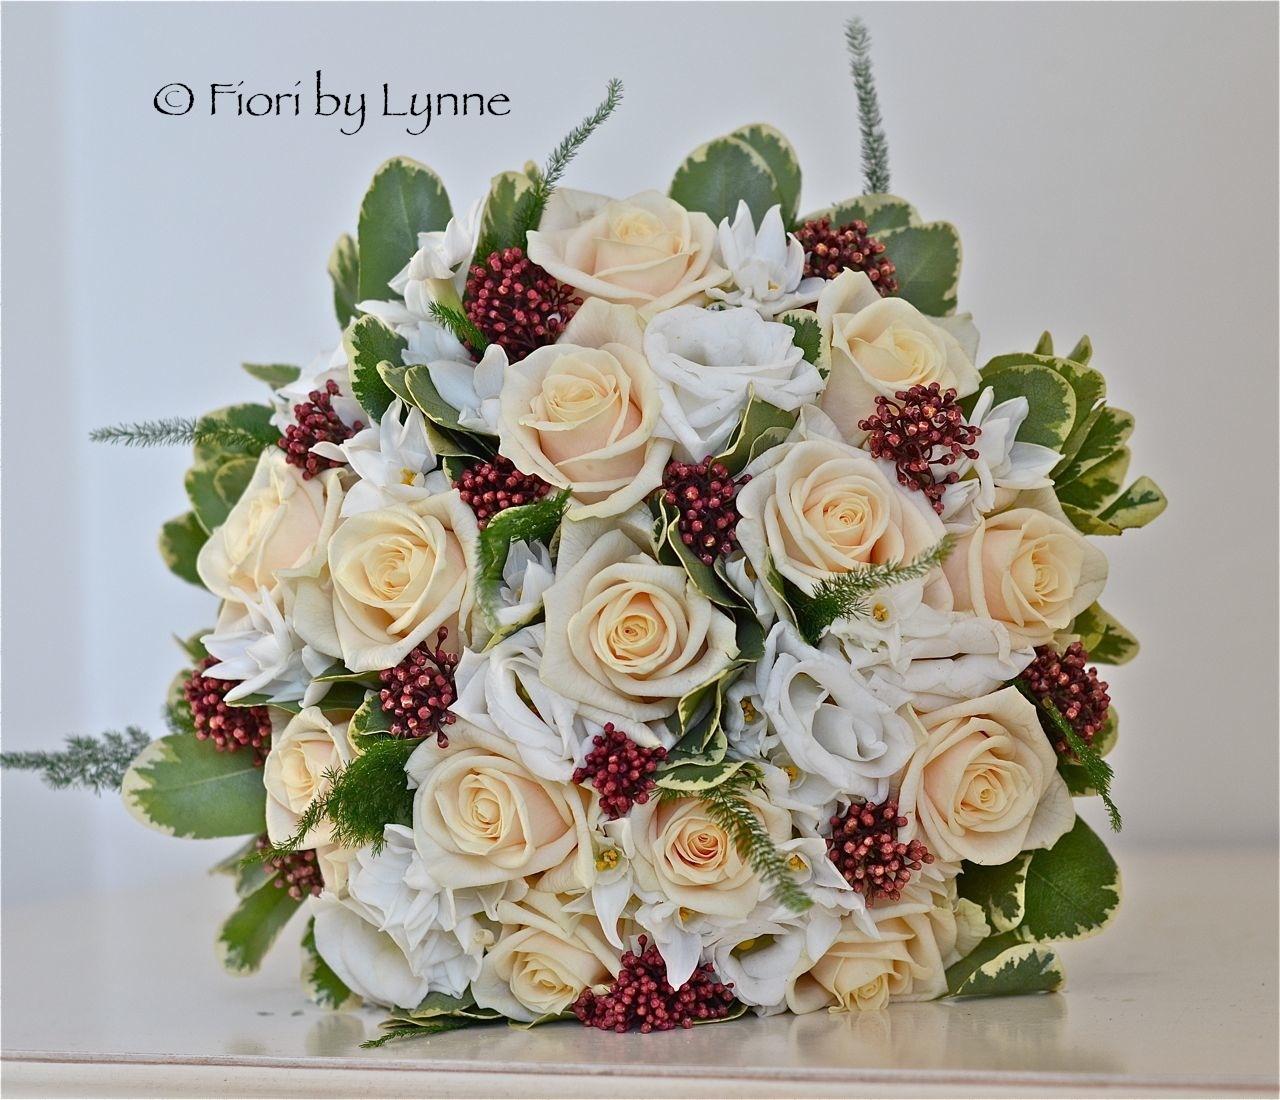 Wedding Flowers In February: Wedding Flowers Blog: February 2013